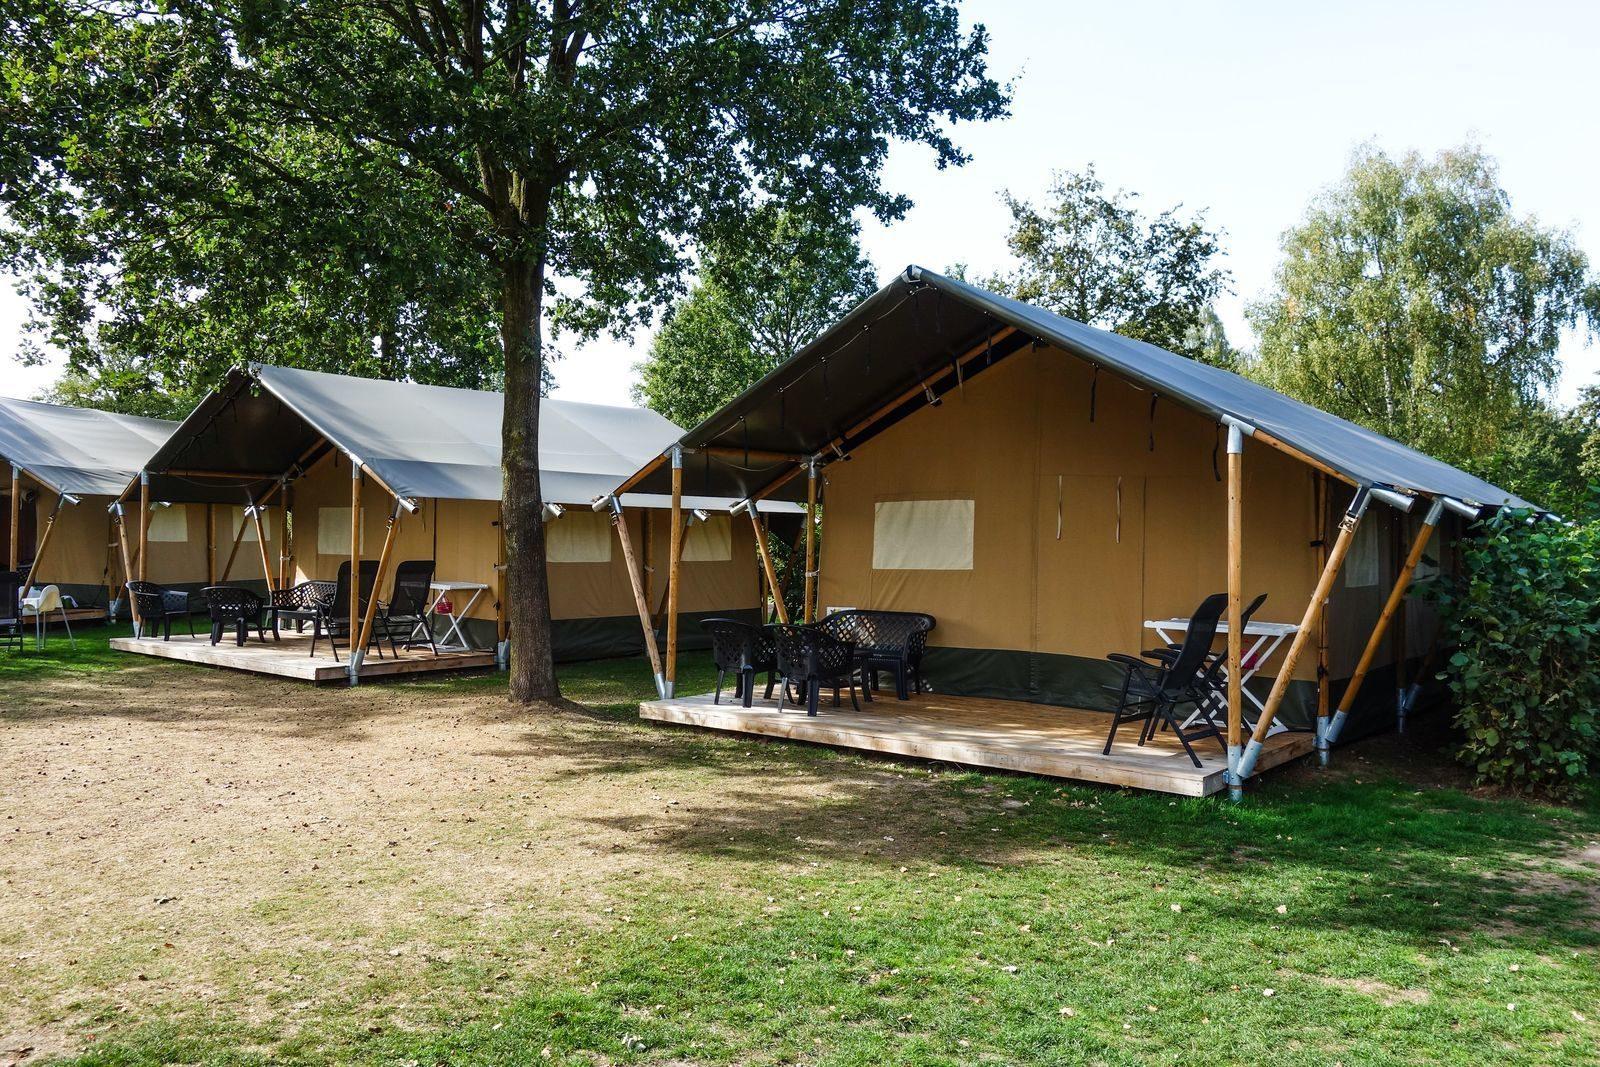 Safari tent in The Netherlands